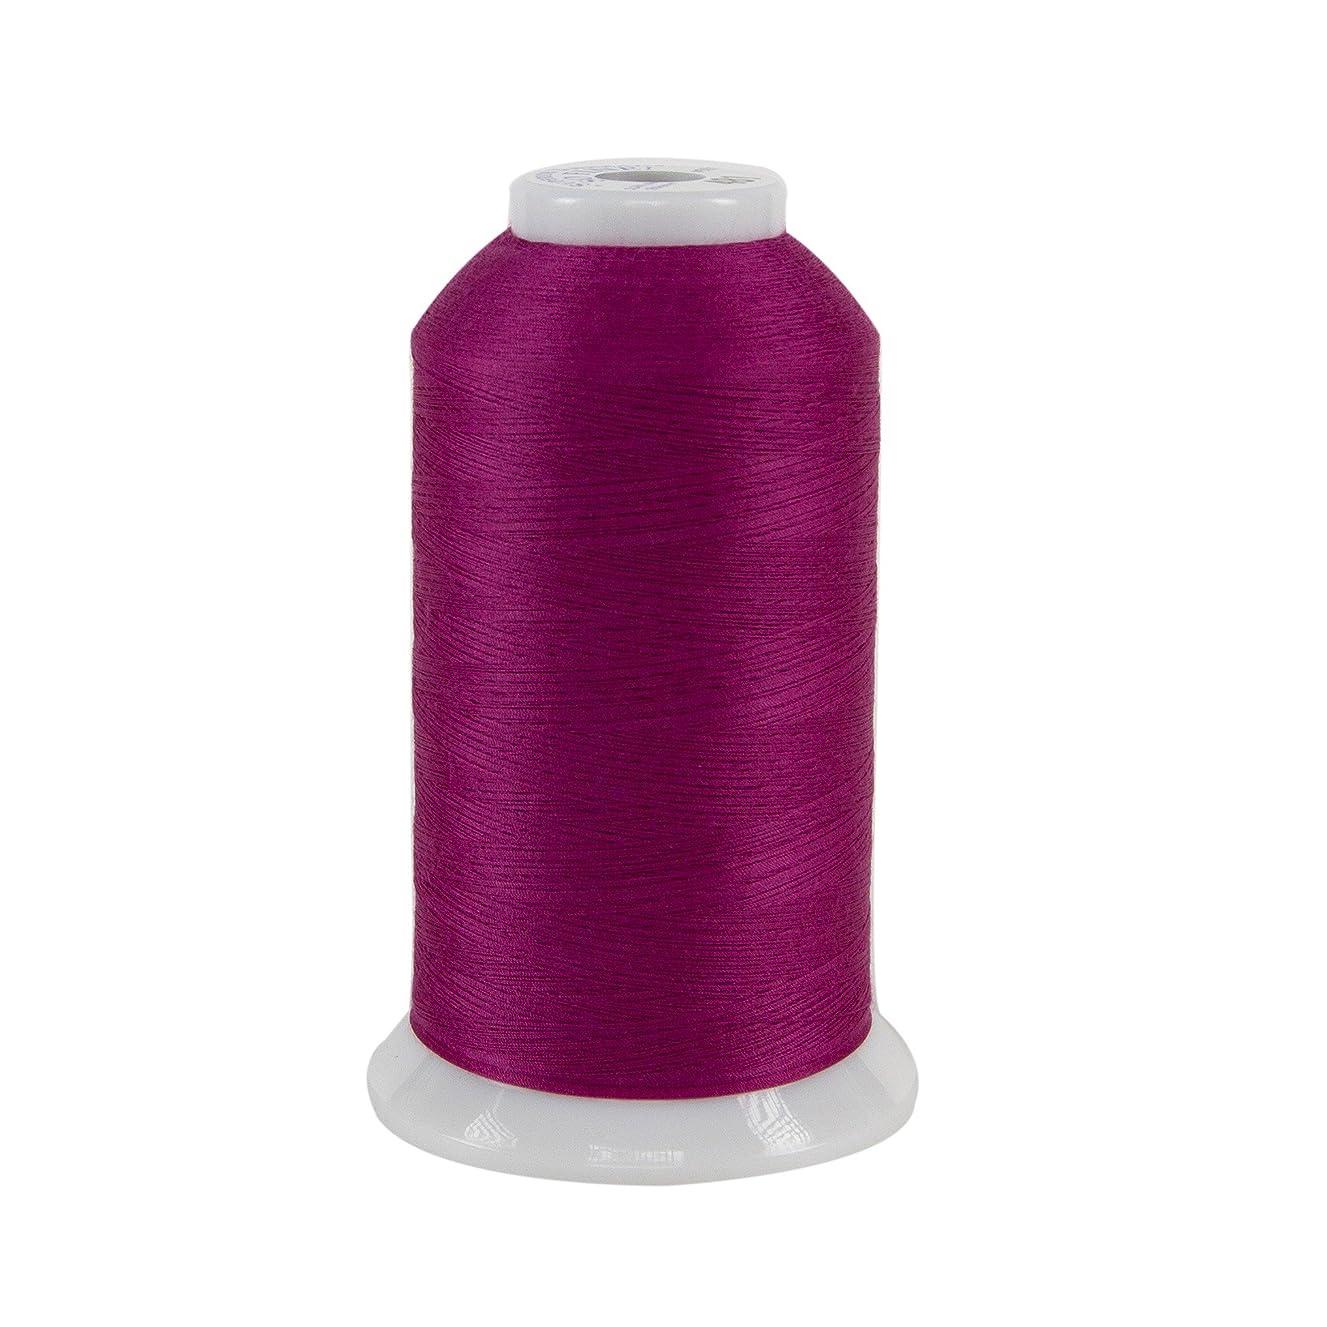 Superior Threads 11602-481 So Fine Bitterroot 3-Ply 50W Polyester Thread, 3280 yd